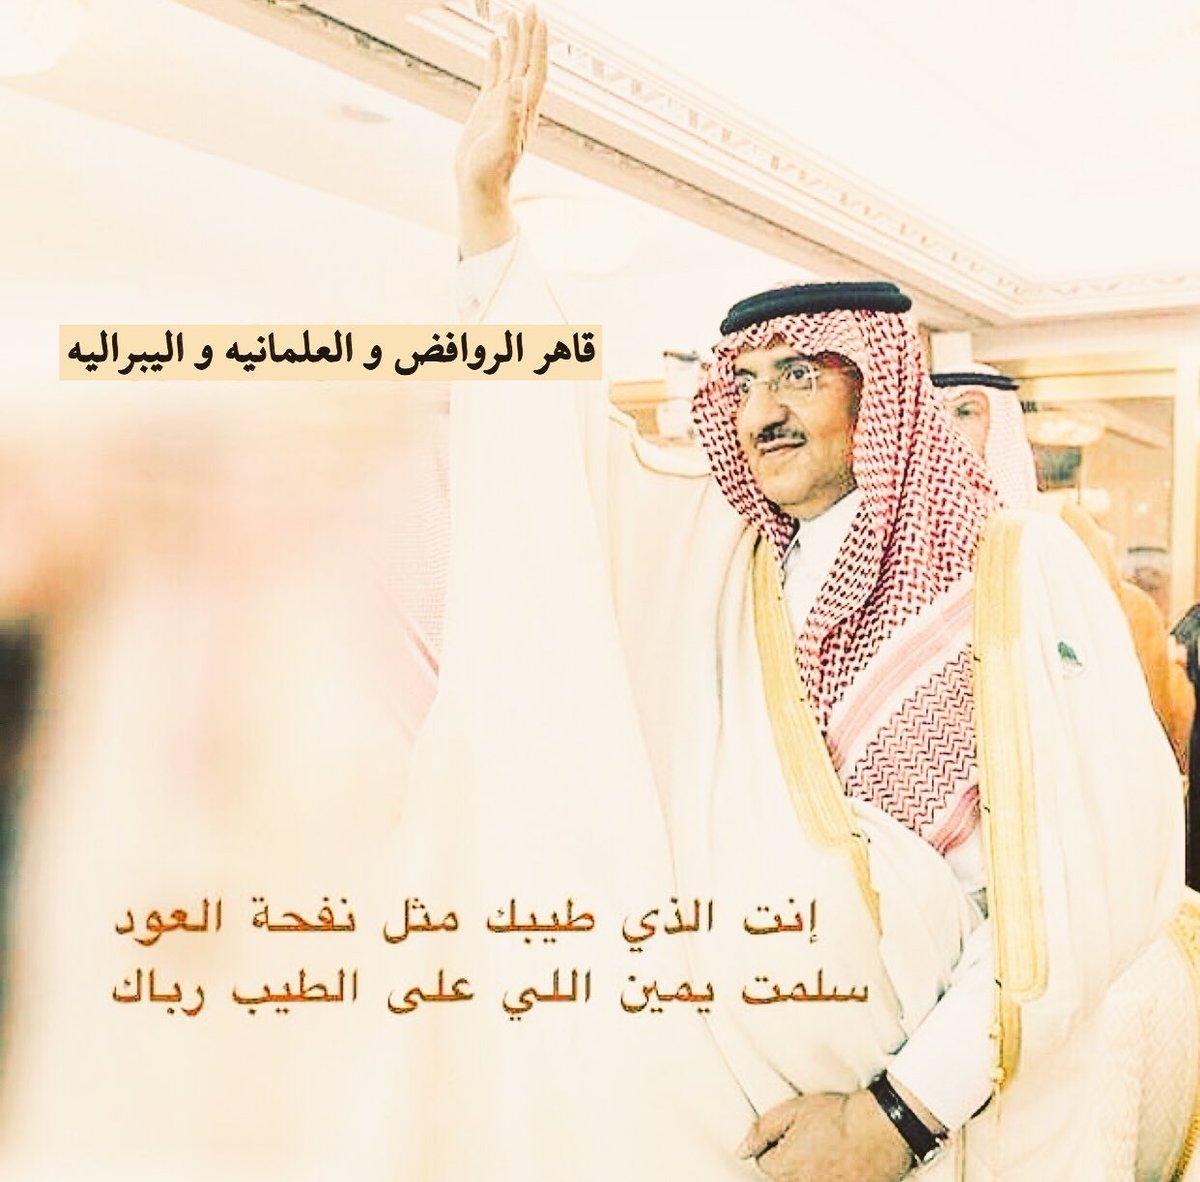 @M_Naif_Alsaud  . صاحب السمو الملكي  #ال...